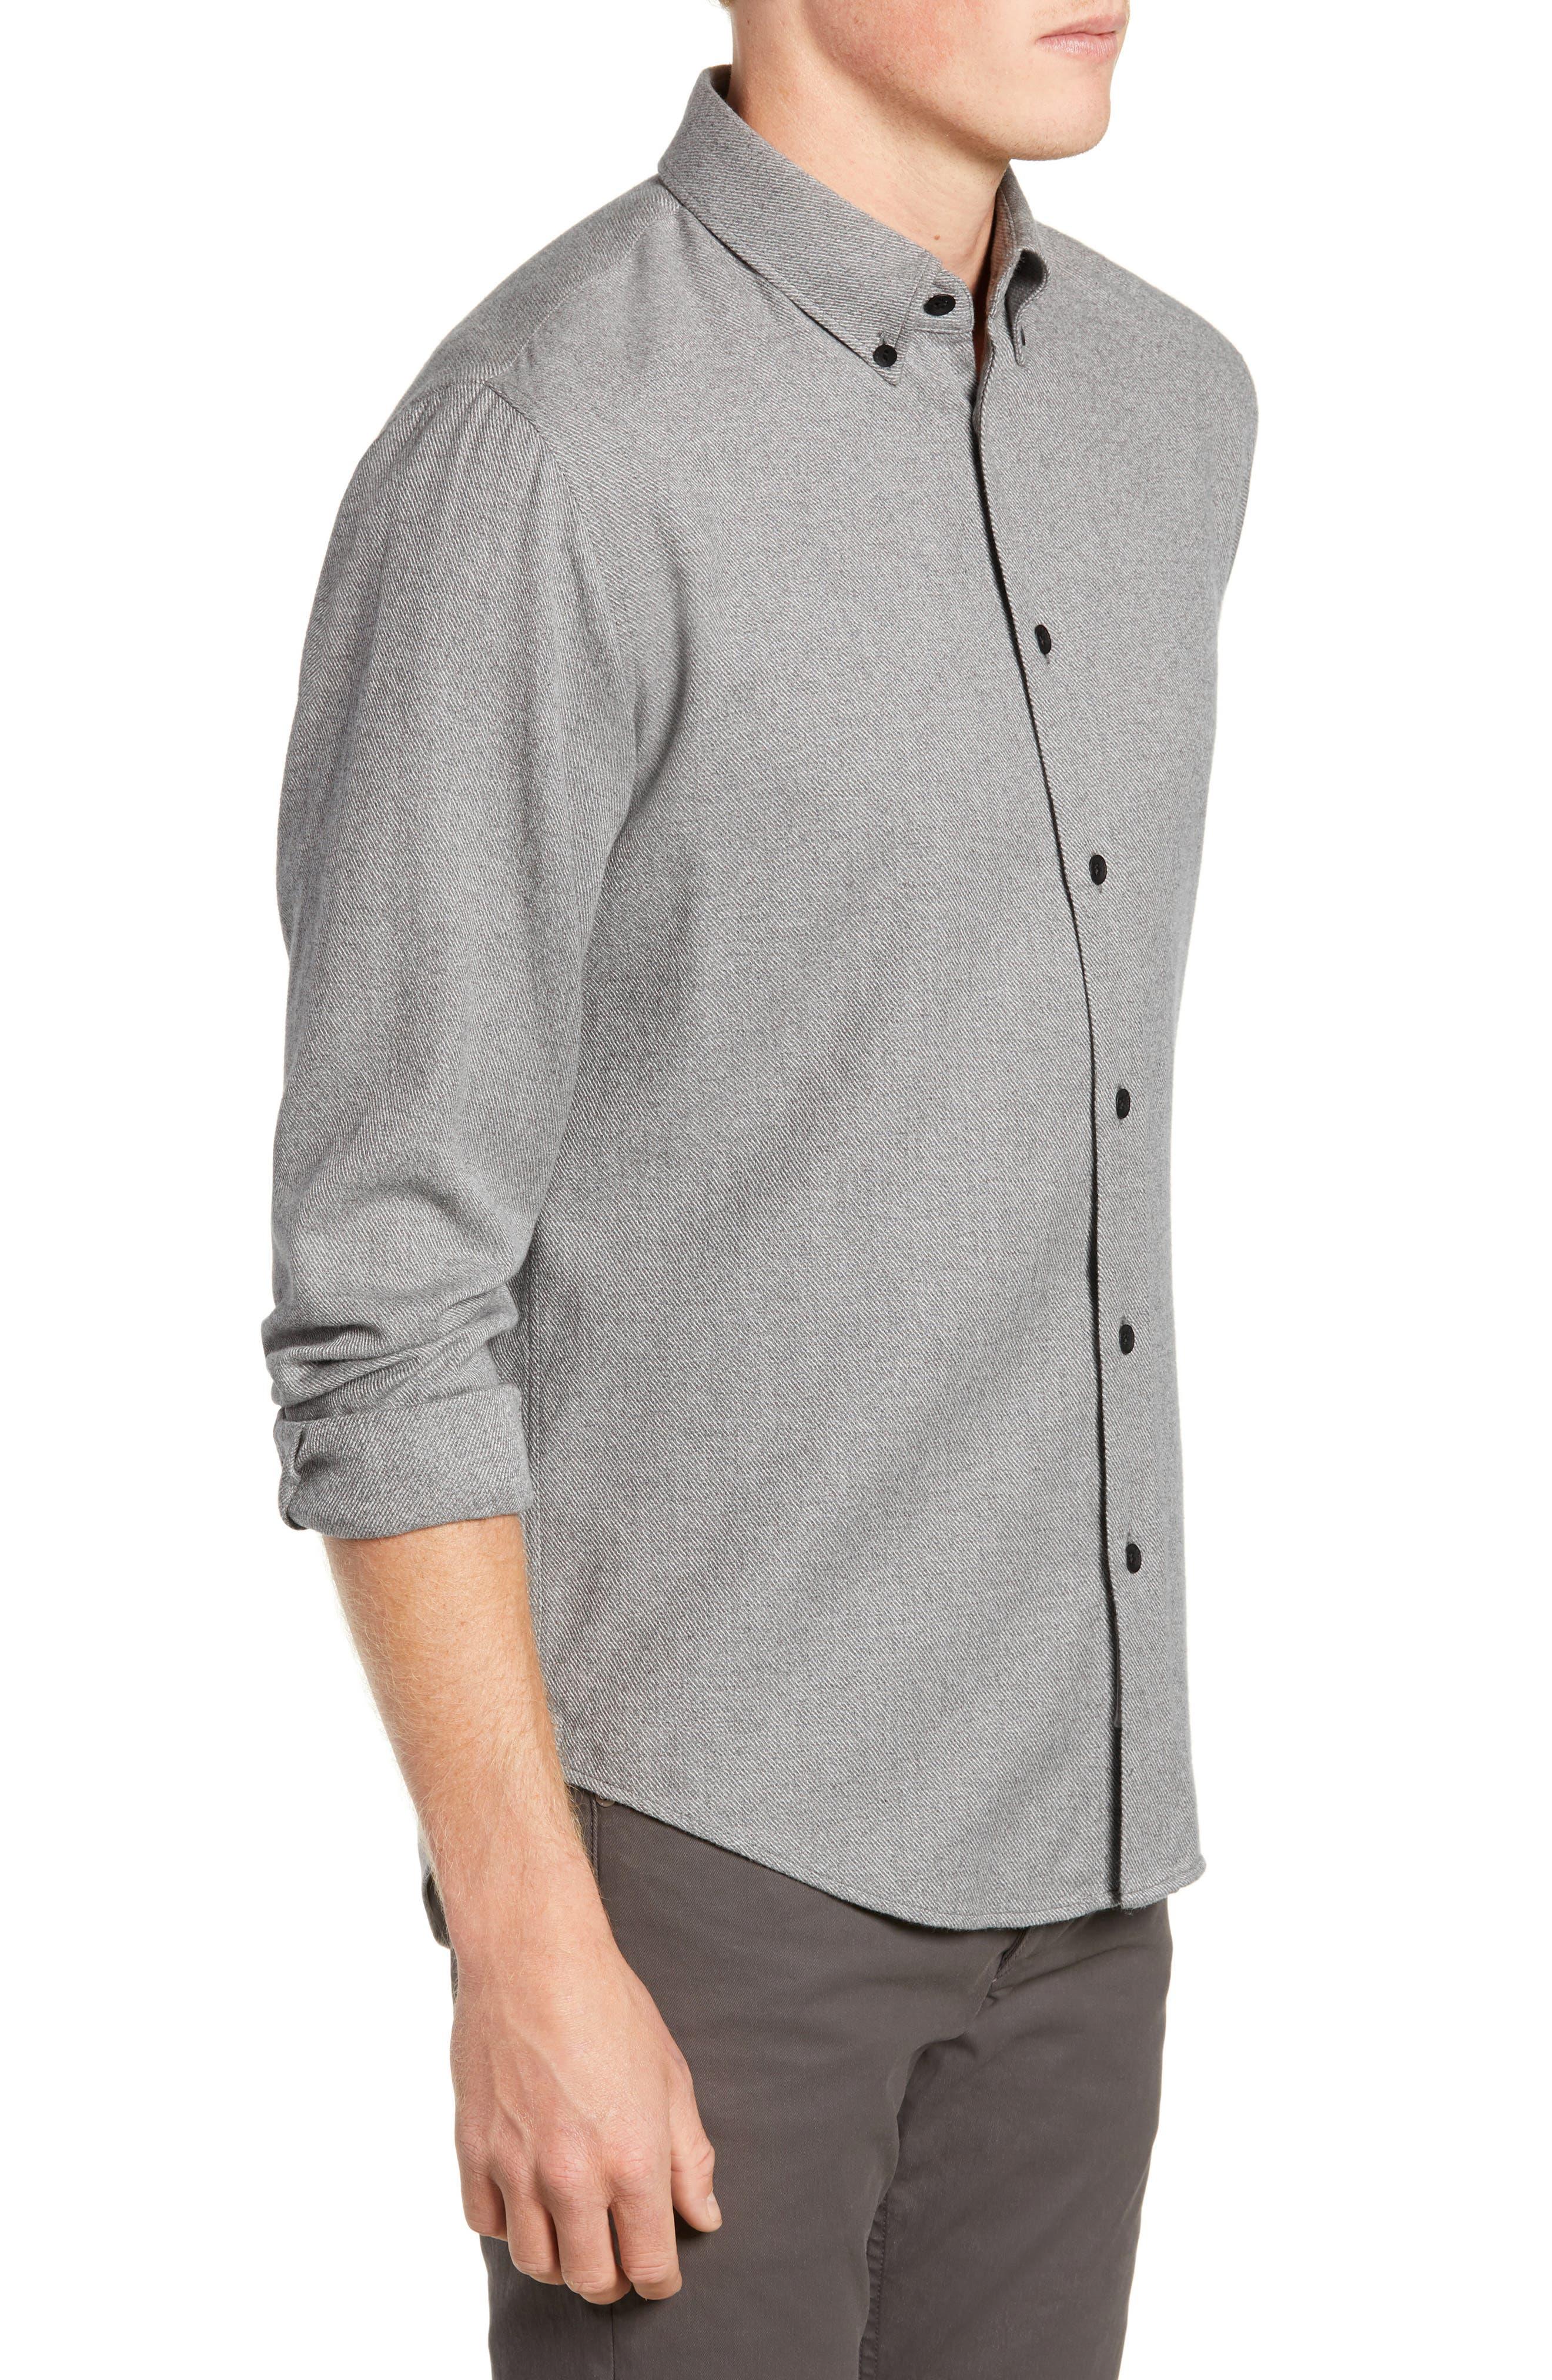 Fit 2 Tomlin Twill Sport Shirt,                             Alternate thumbnail 4, color,                             GREY